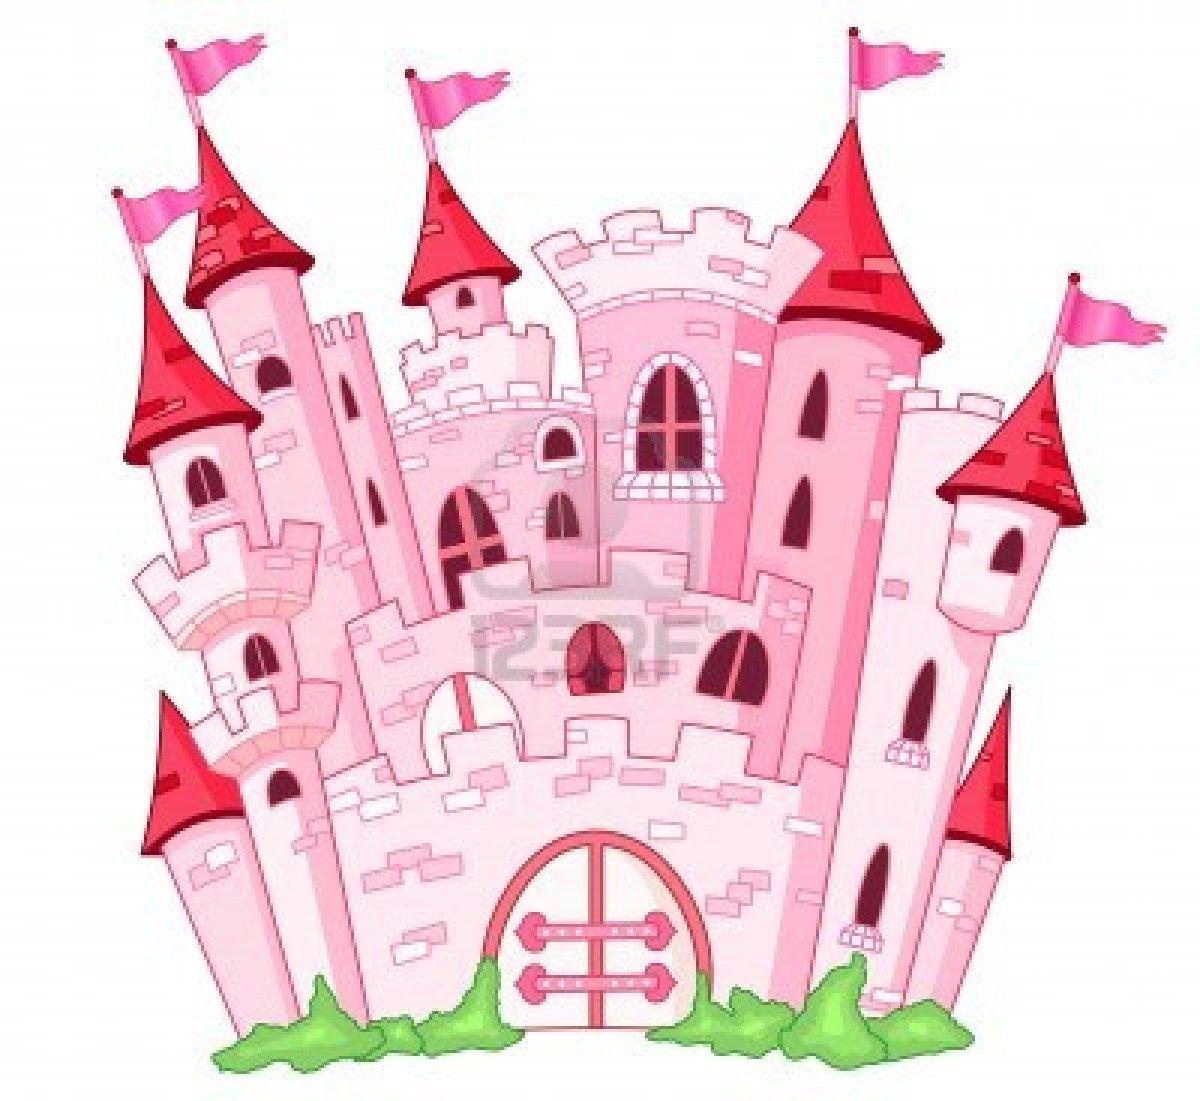 Castle cartoon clipart jpg transparent stock Princess Castle Cartoon | Clipart Panda - Free Clipart Images jpg transparent stock